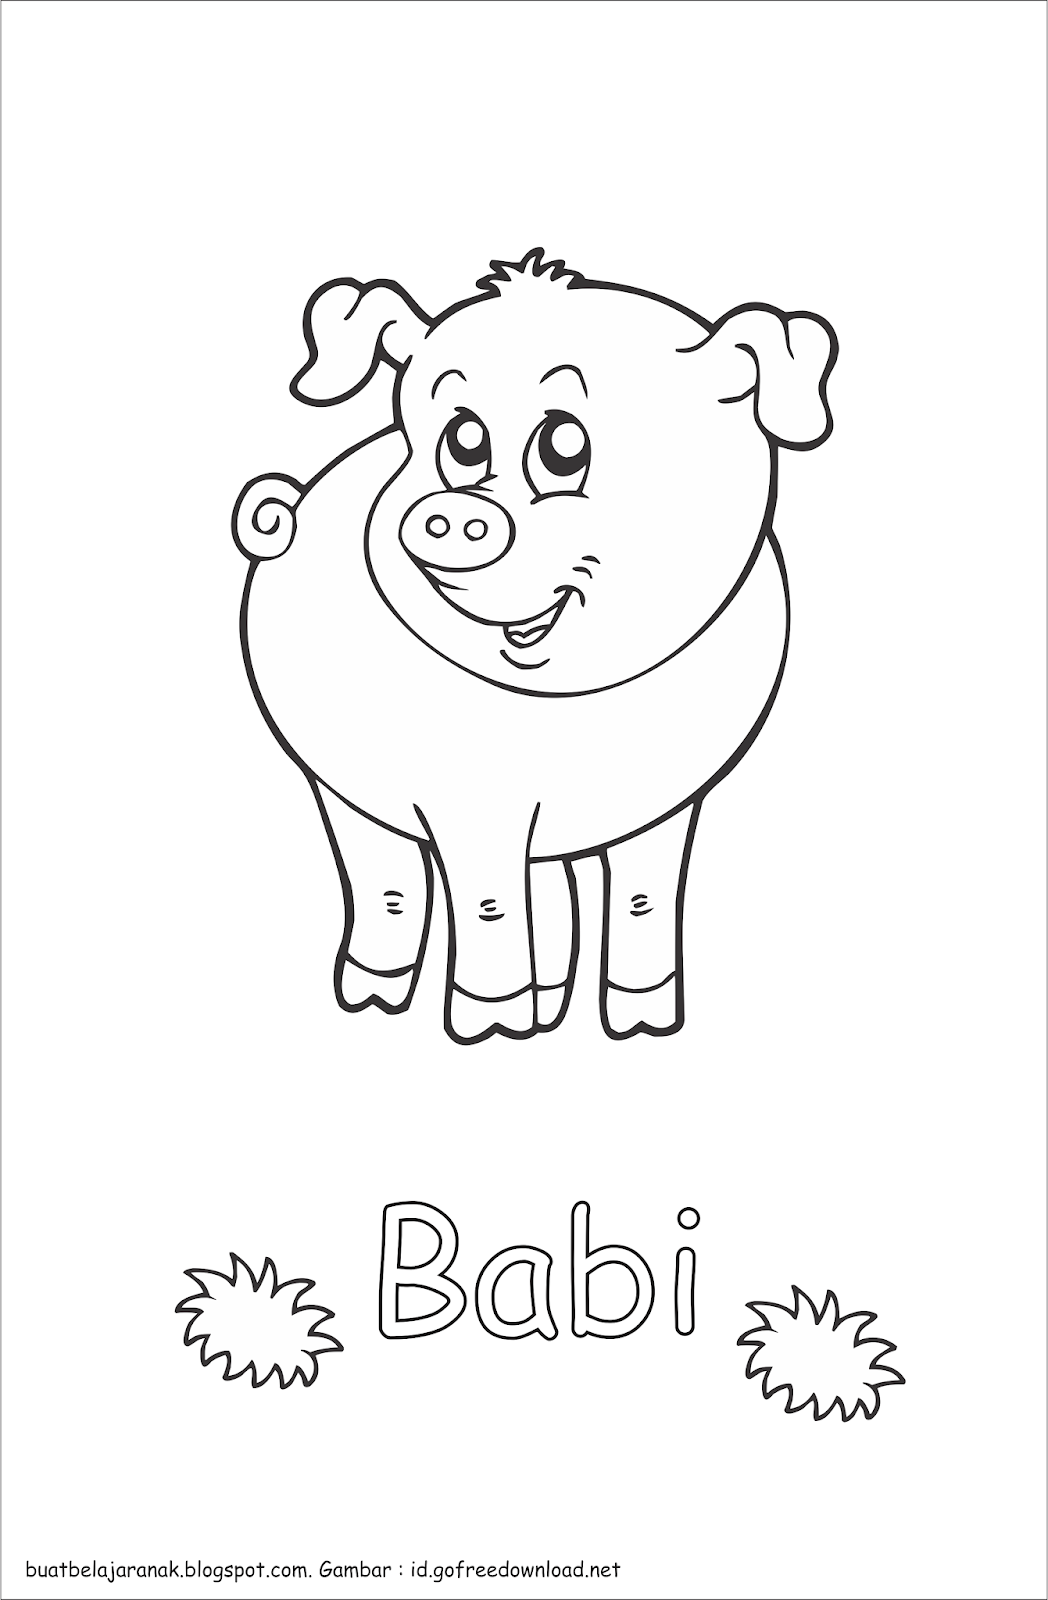 74 Gambar Babi Untuk Diwarnai Kekinian Infobaru